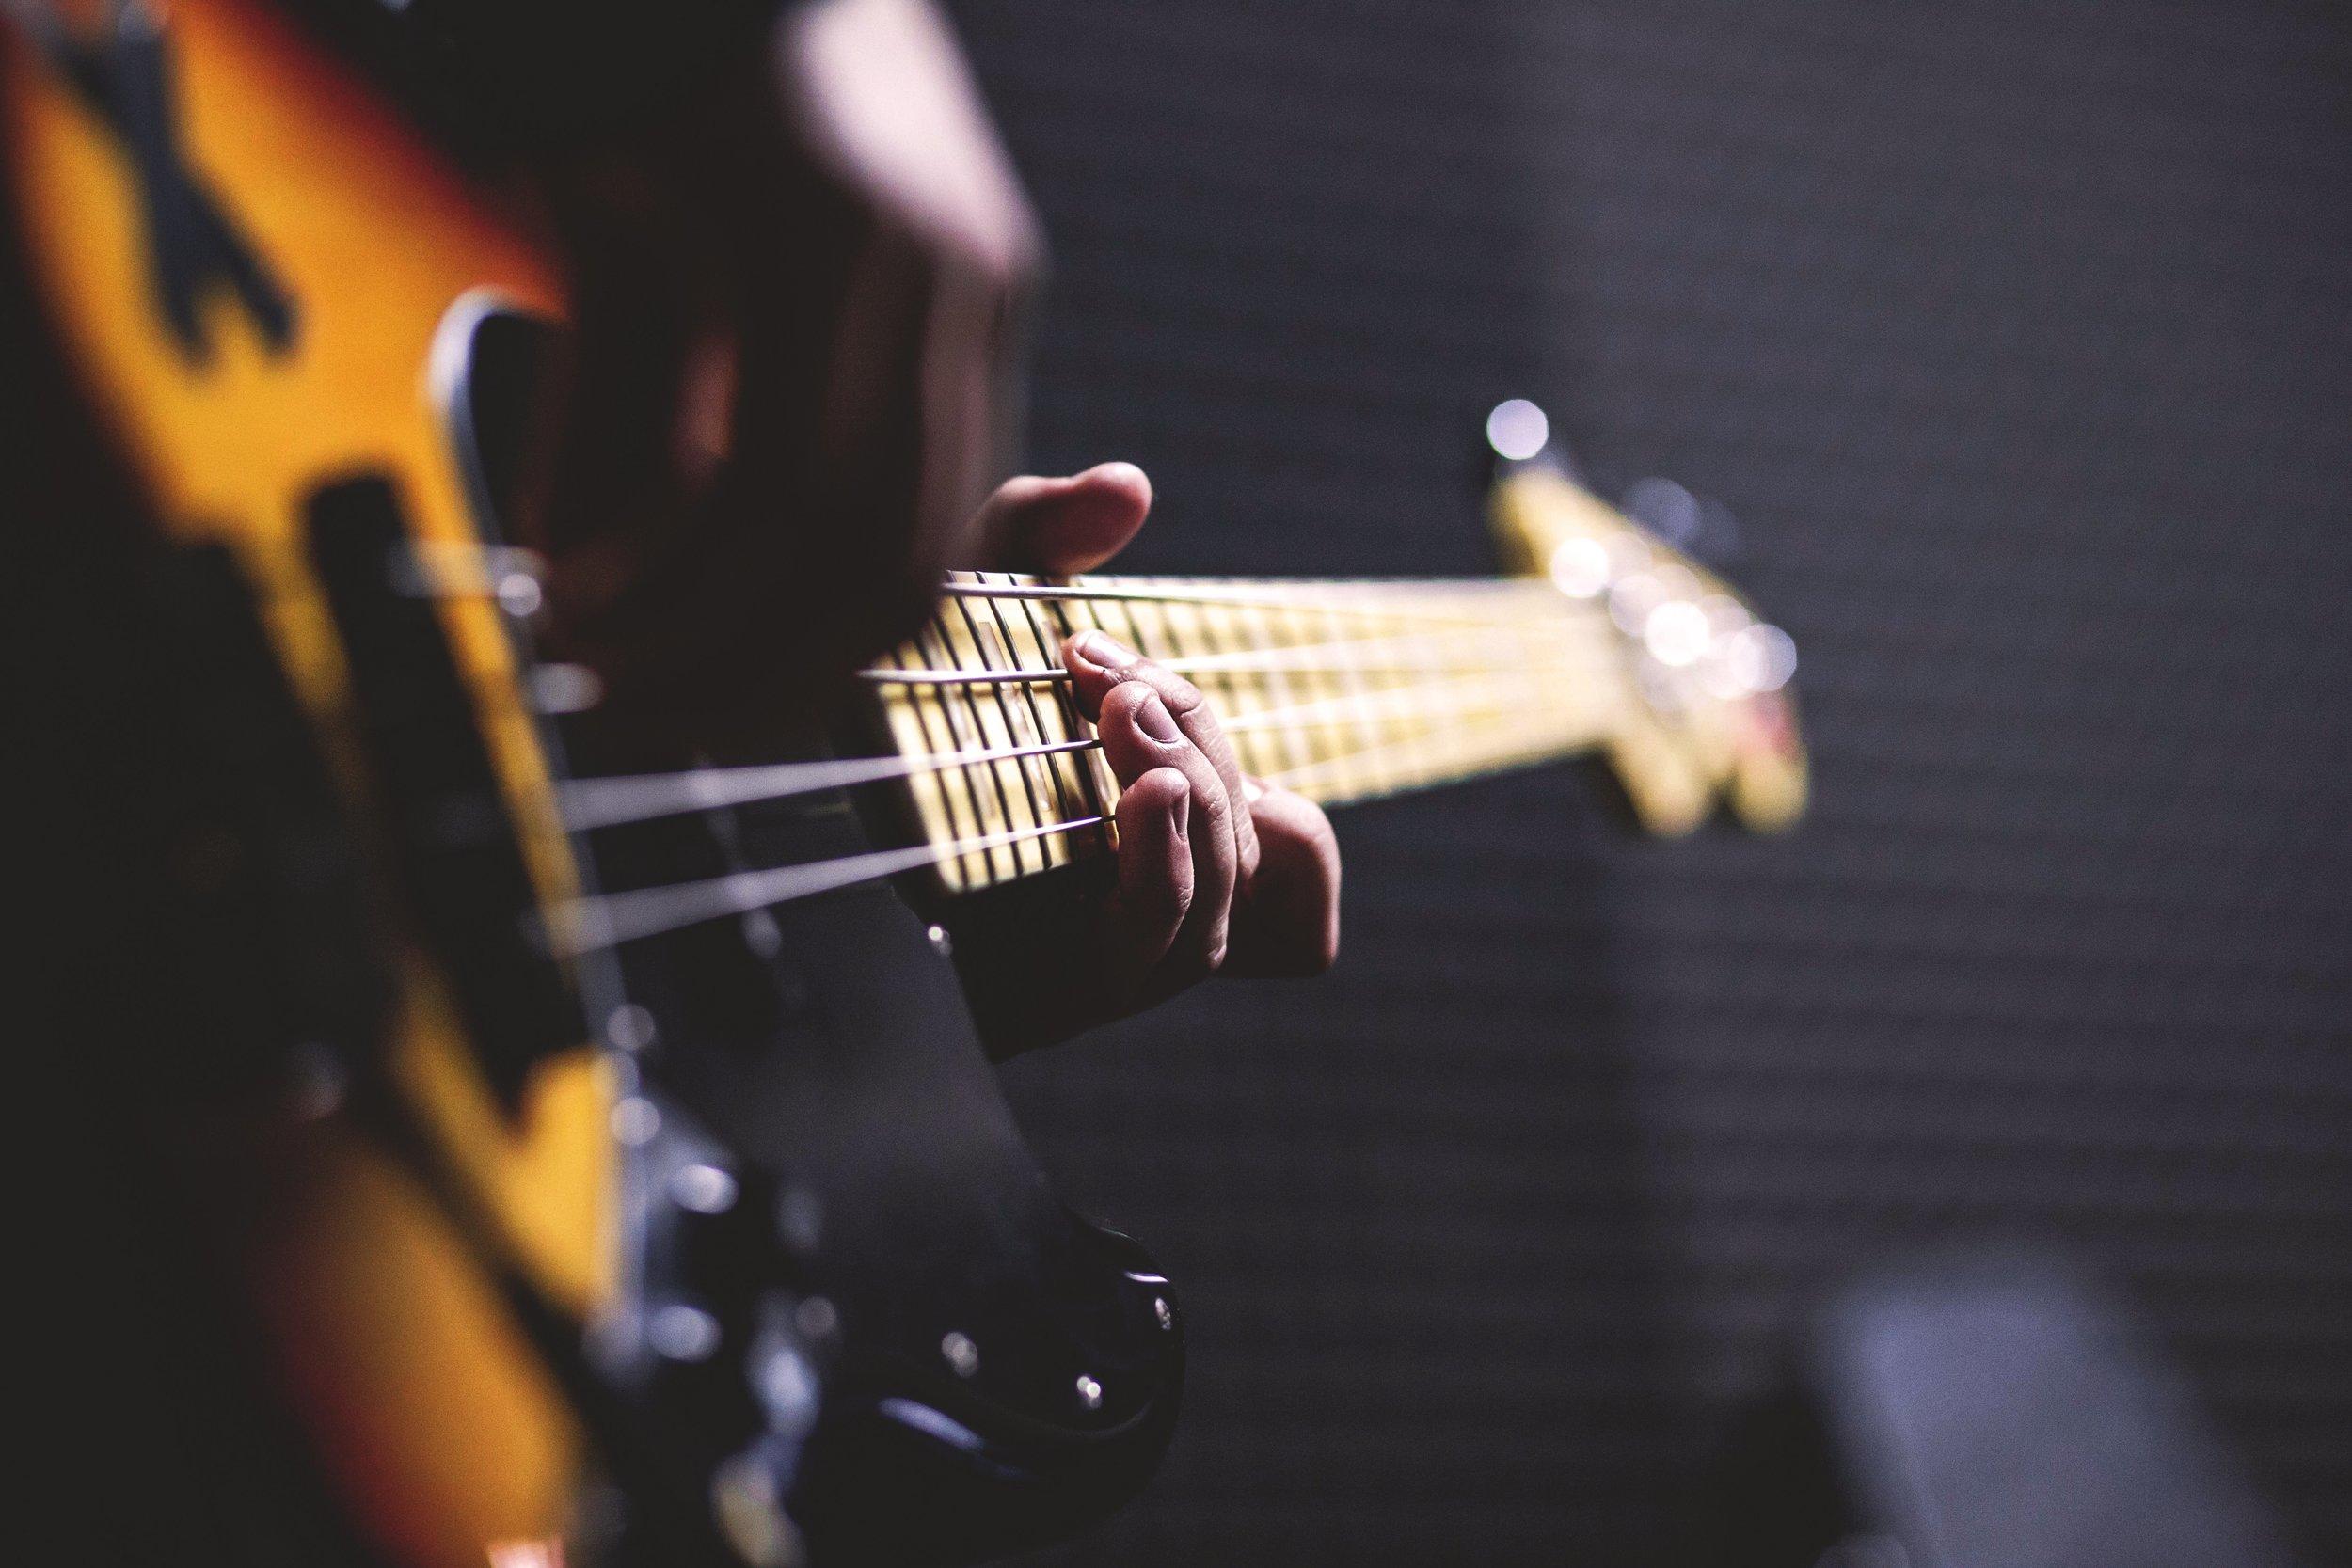 bass-guitar-chord-close-up-96380.jpg